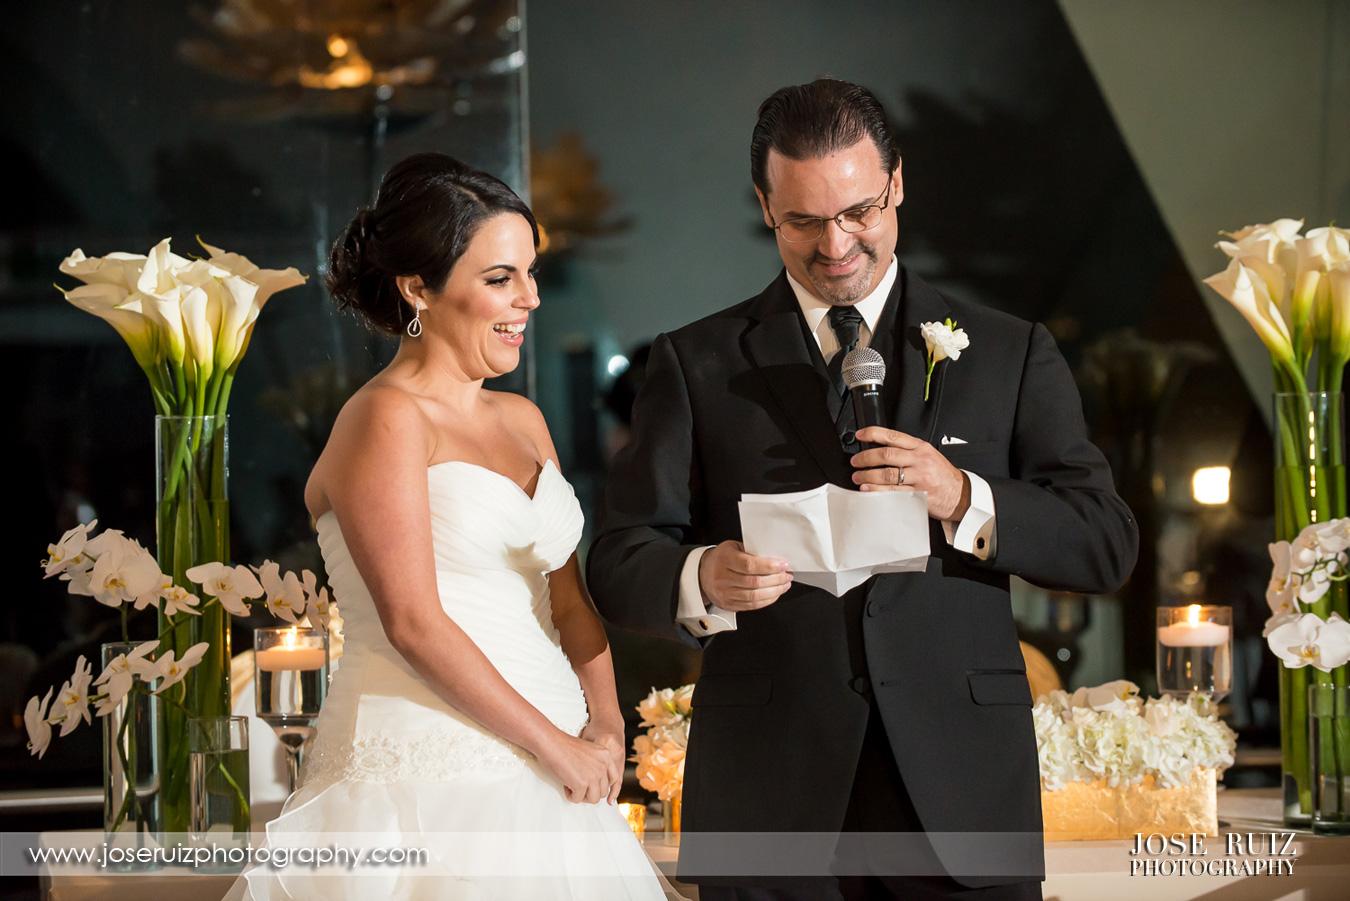 Vanessa-&-Antonio-0077.jpg